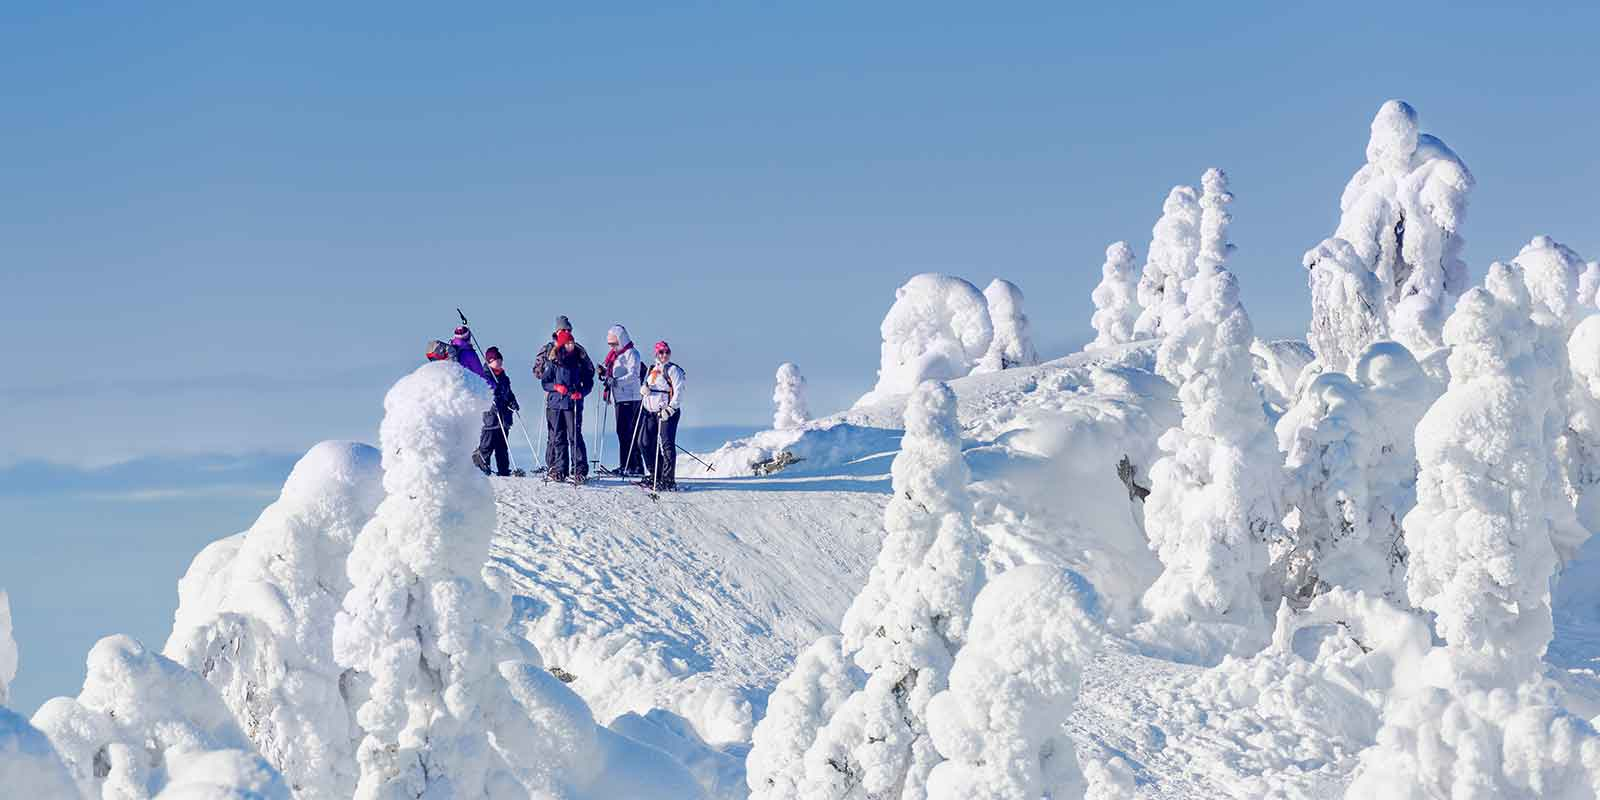 Cross-country skiiers in Koli National Park in Finland